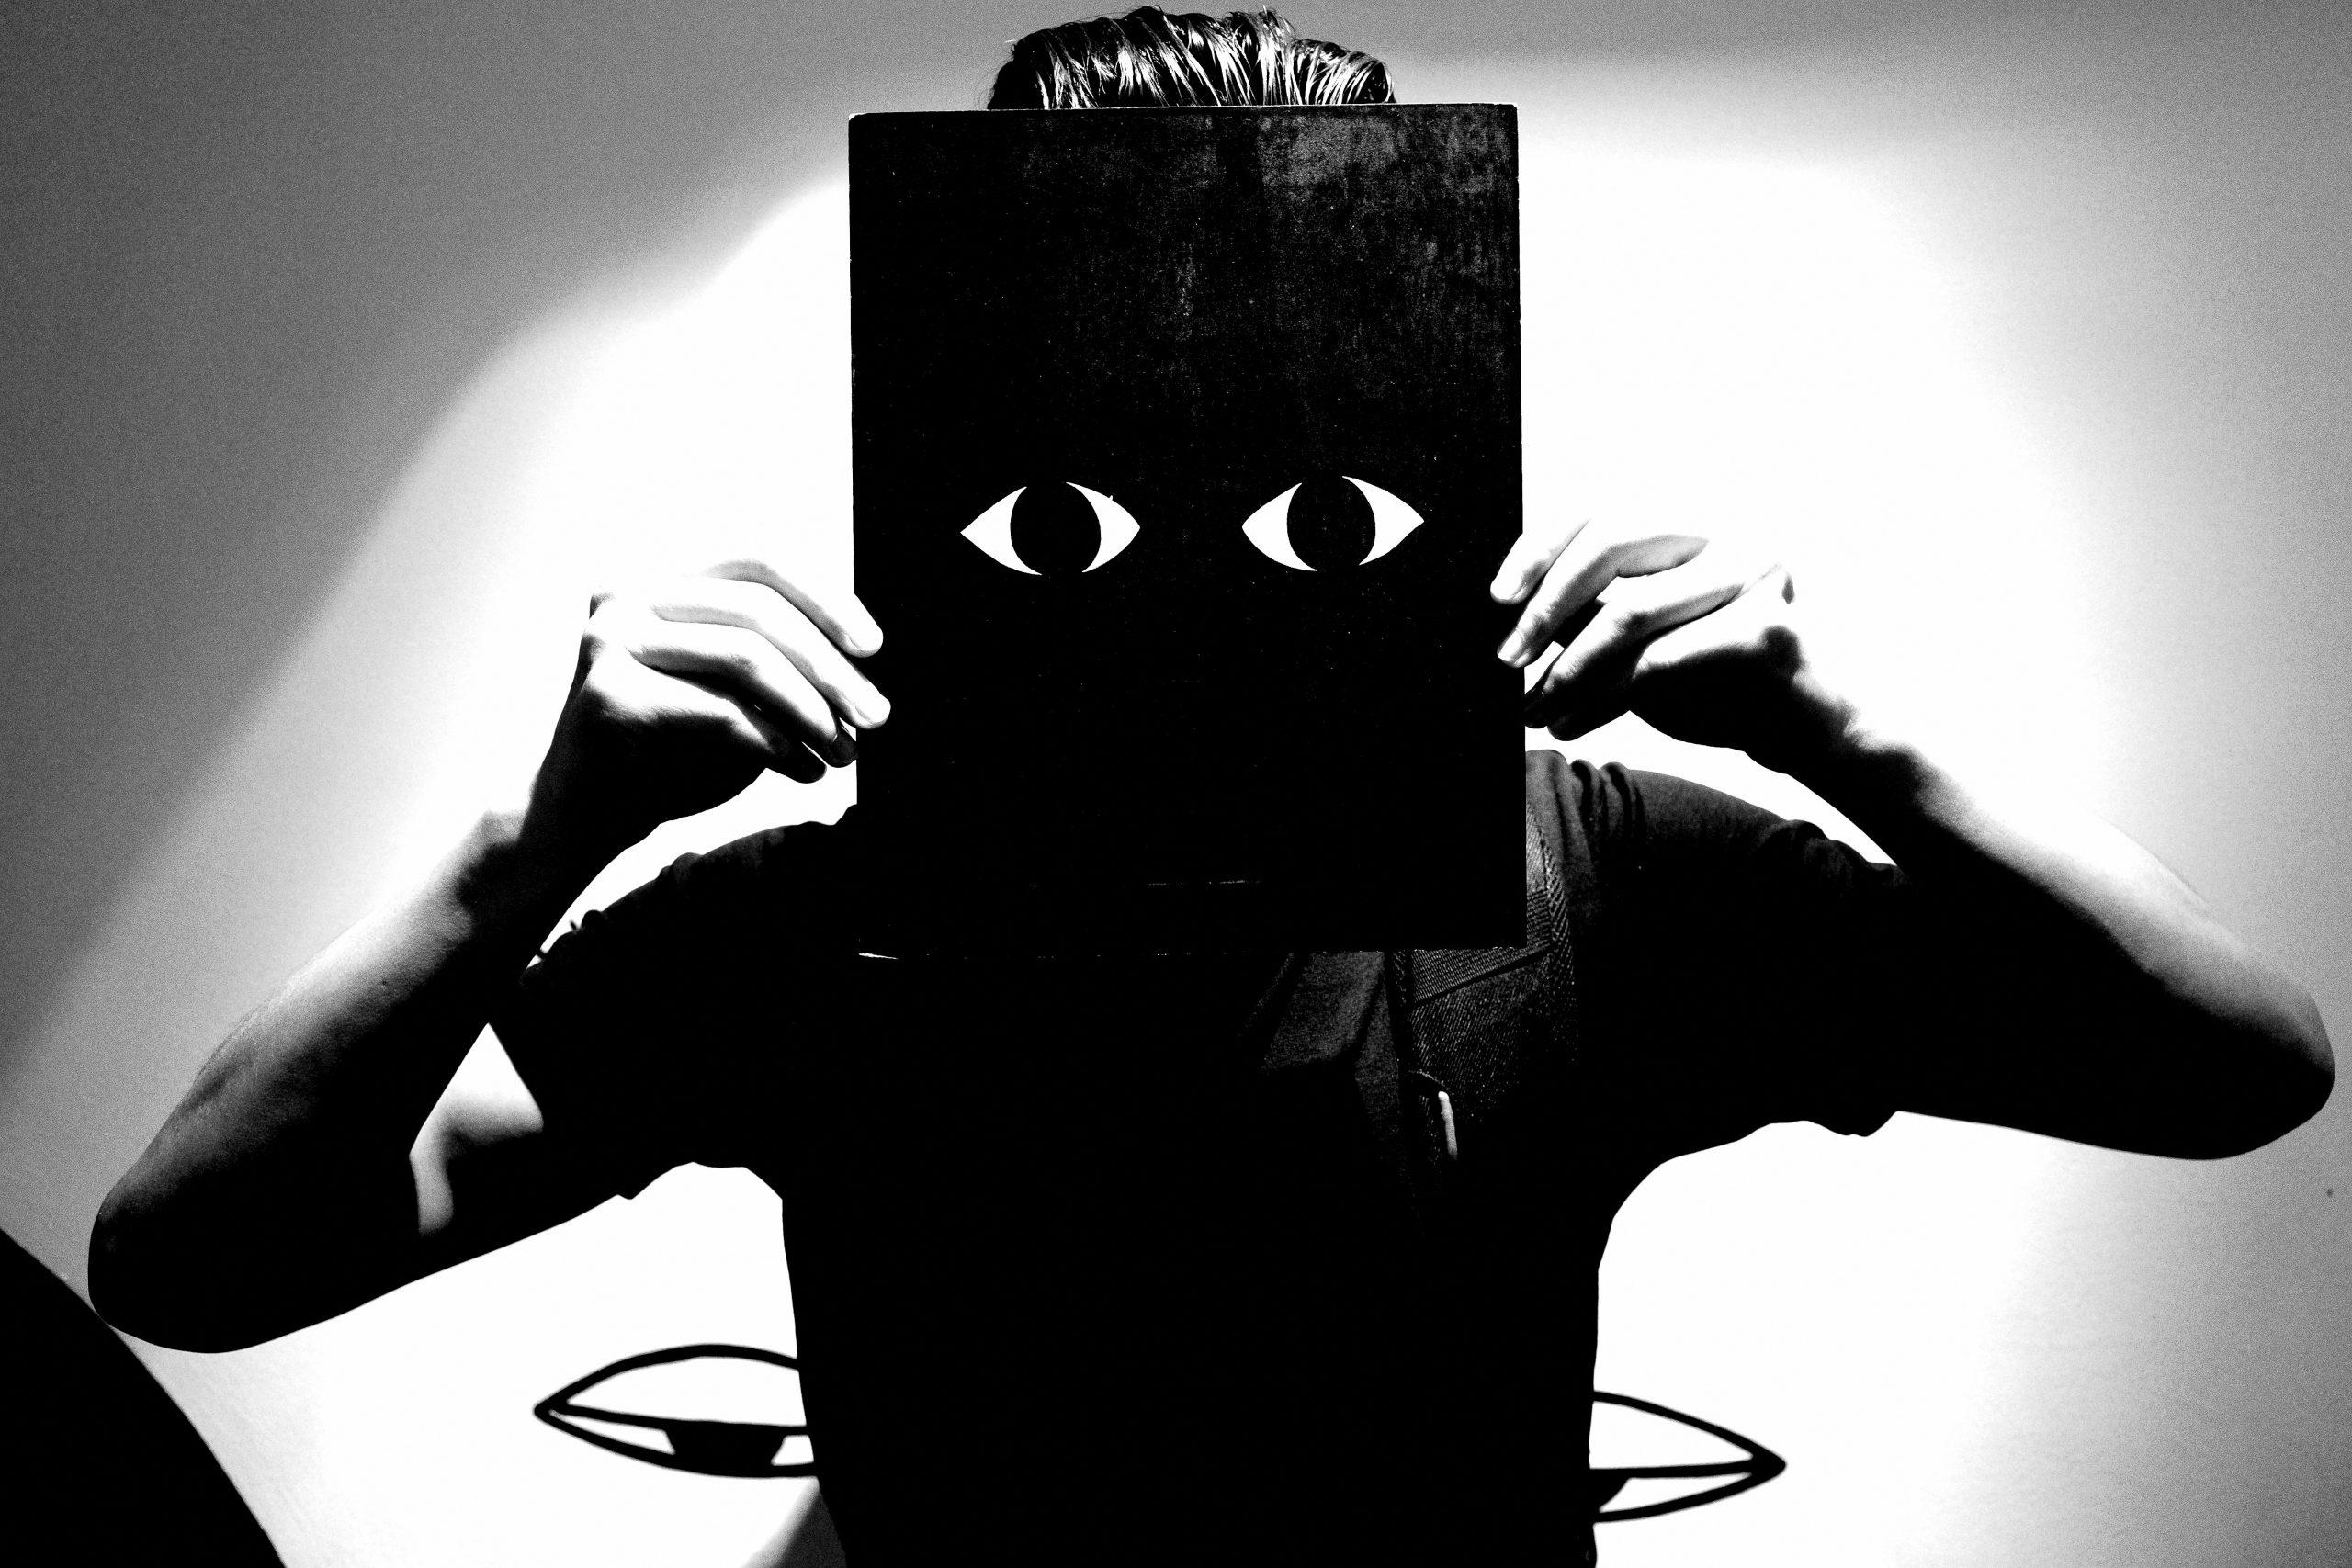 ERIC KIM eyes black surreal